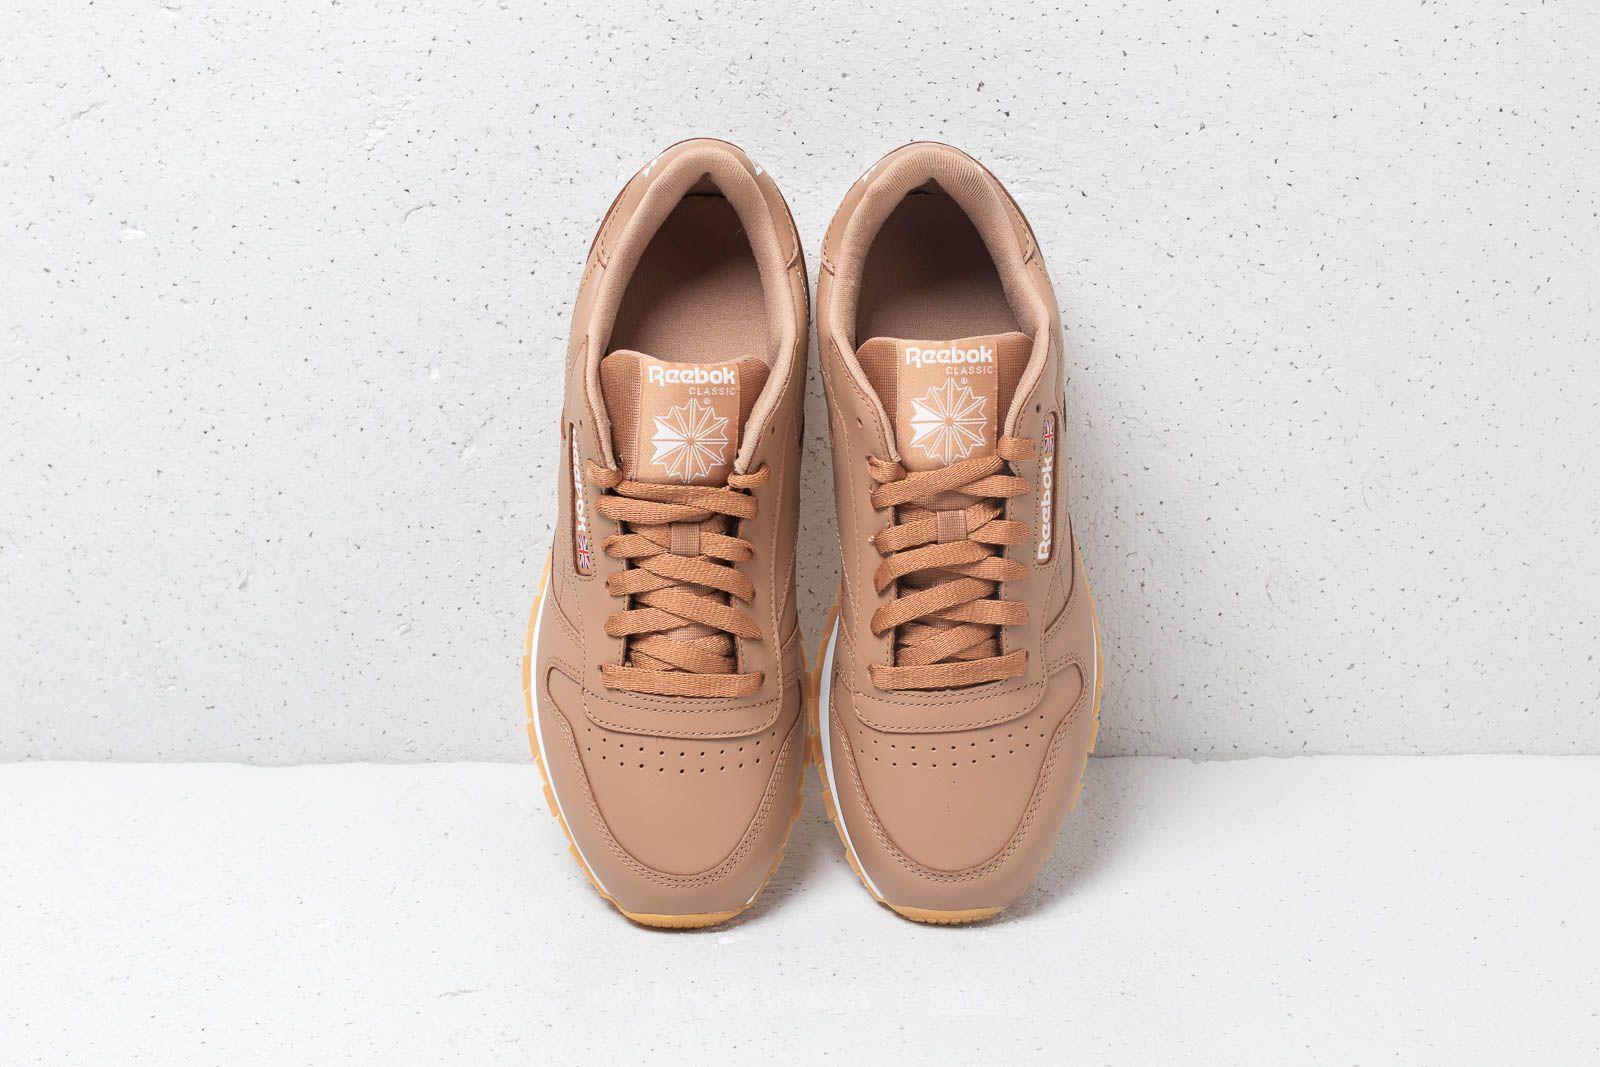 Rebobinar flaco Fiel  Men's shoes Reebok CL Leather MU Soft Camel/ White/ Gum